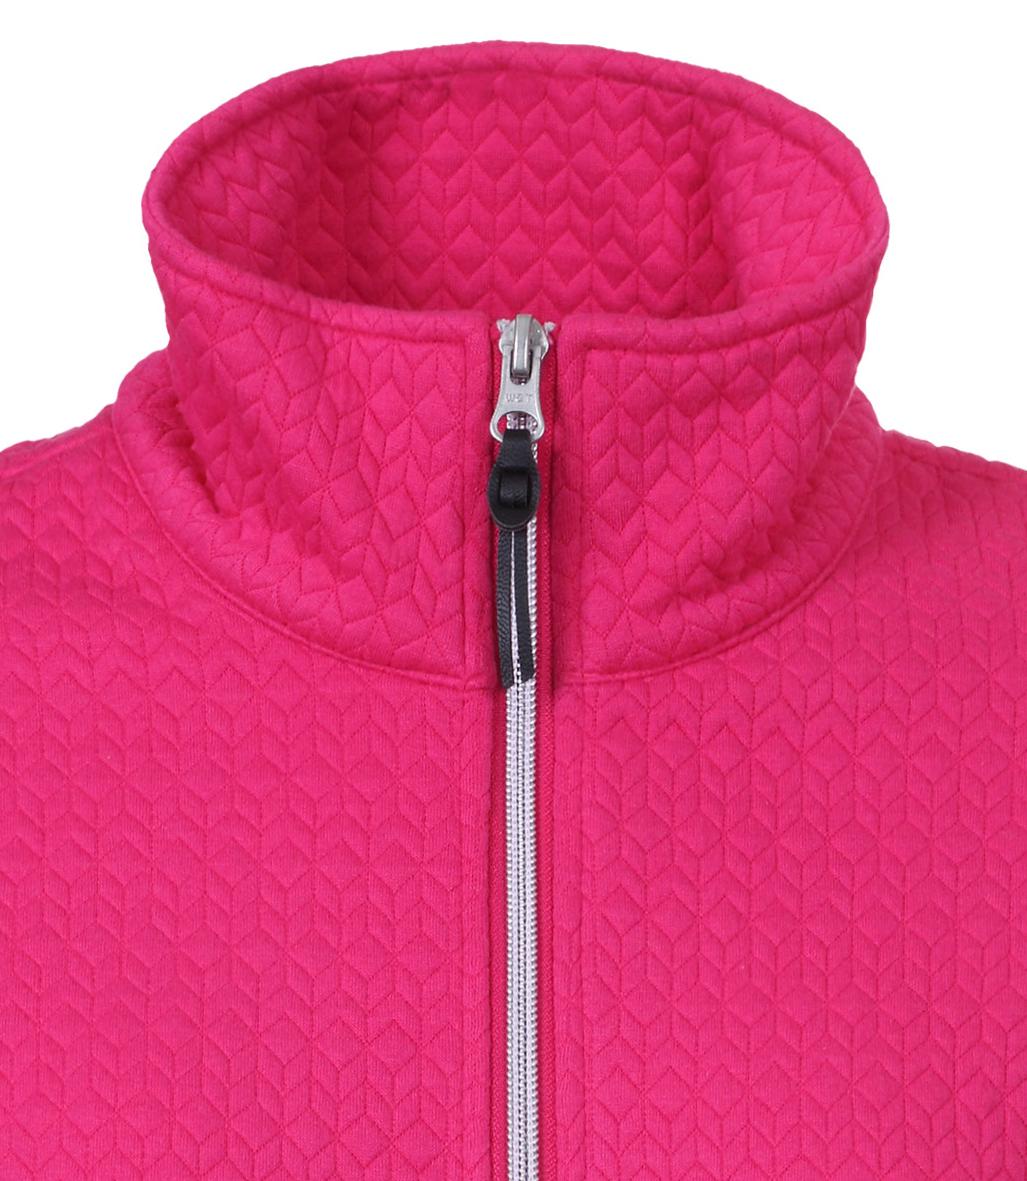 Dámská mikina Icepeak Cydney růžová col. 635 3ca4104bb4